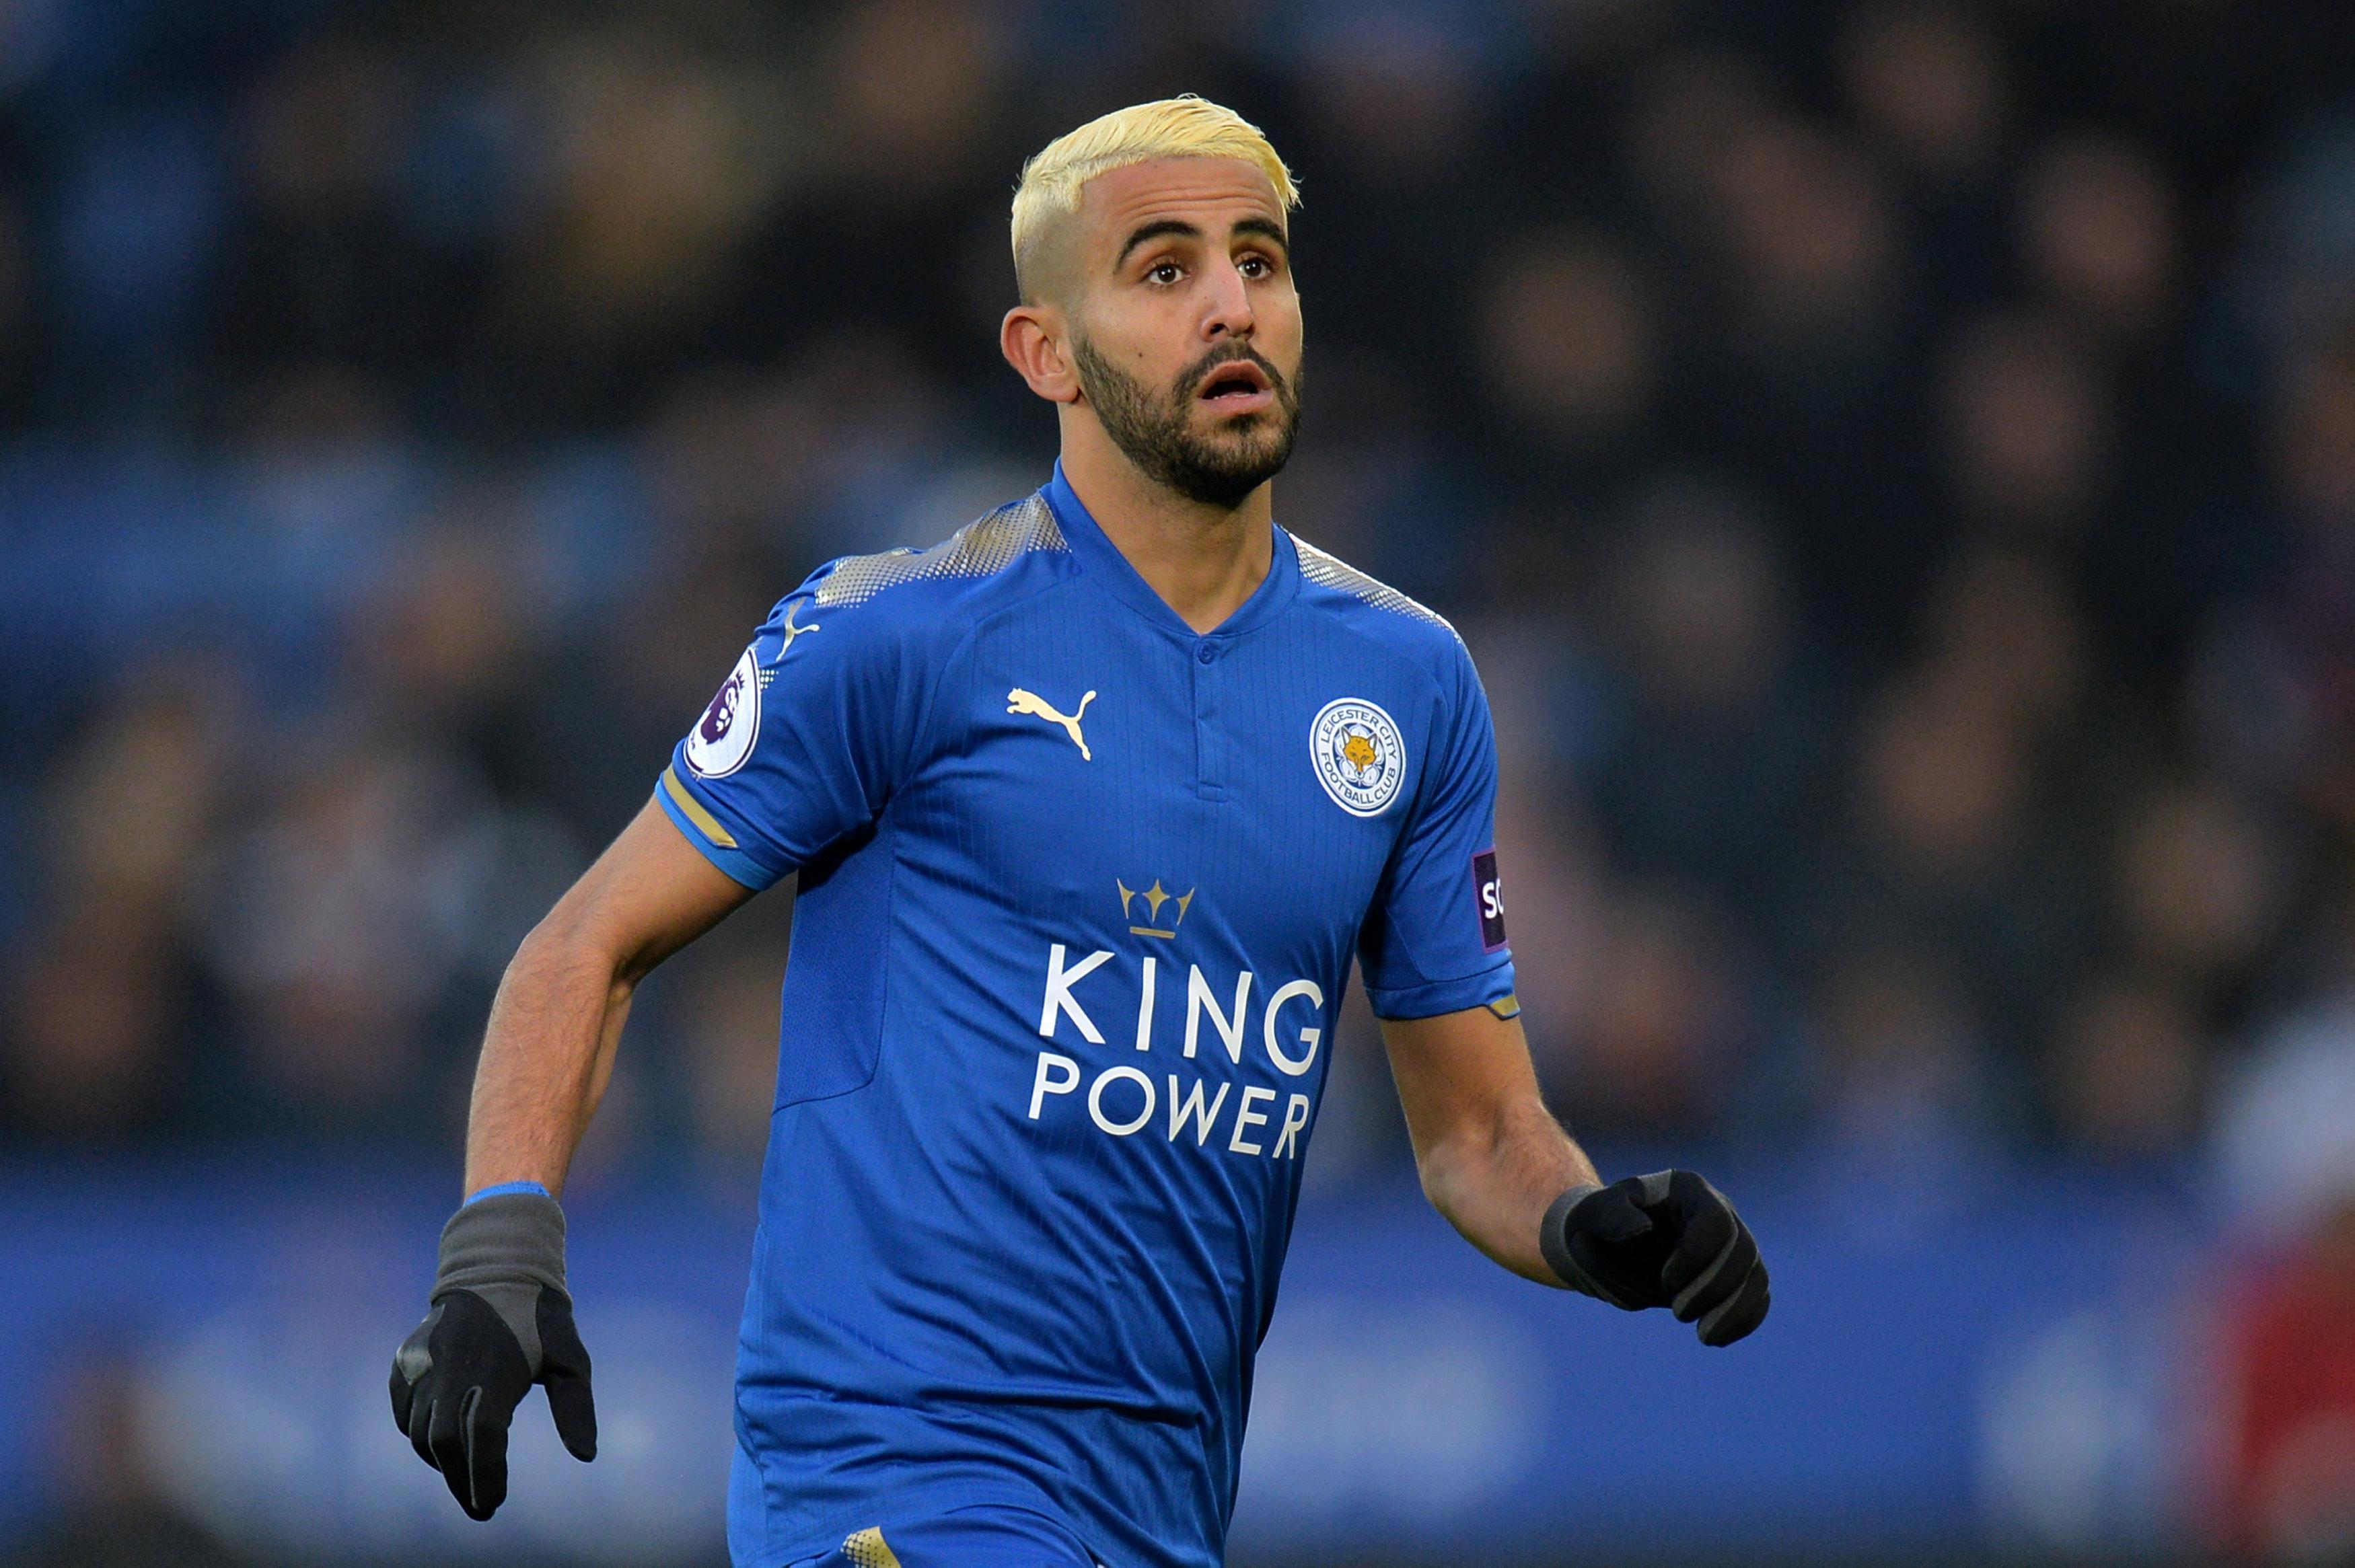 Riyad Mahrez is one big name on Arsenal's radar this winter